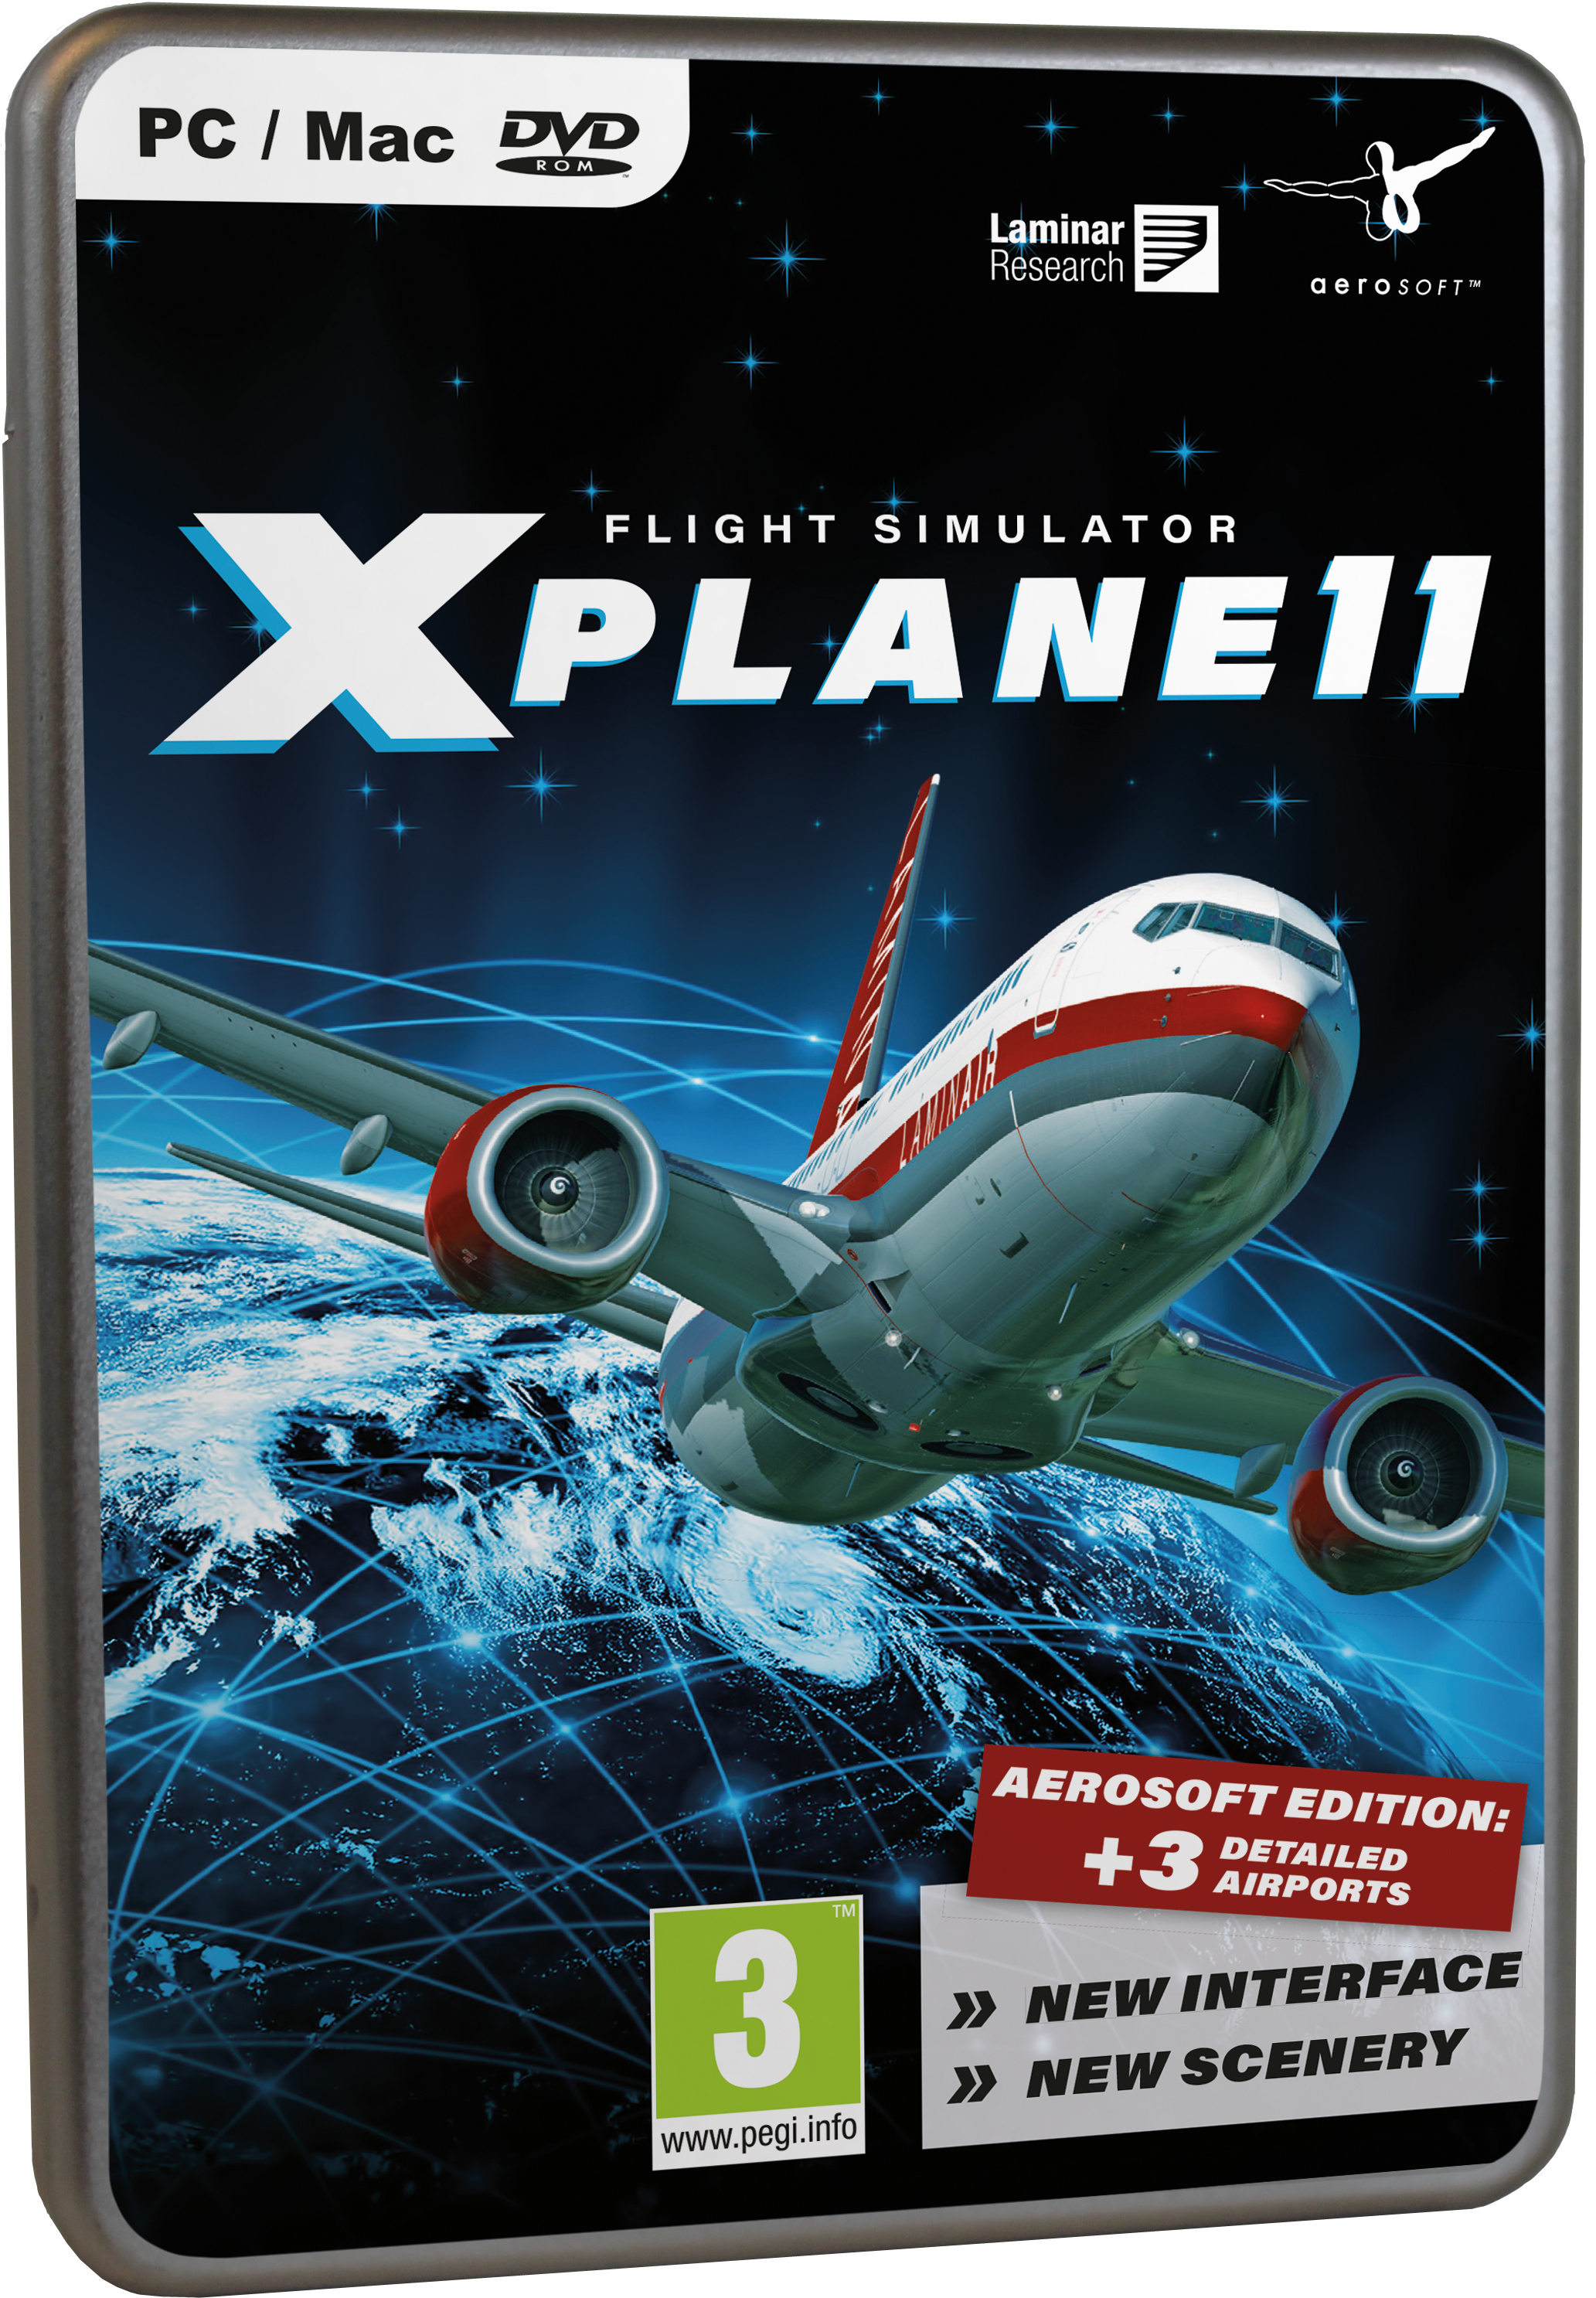 eng-xplane-115881f64b12f22